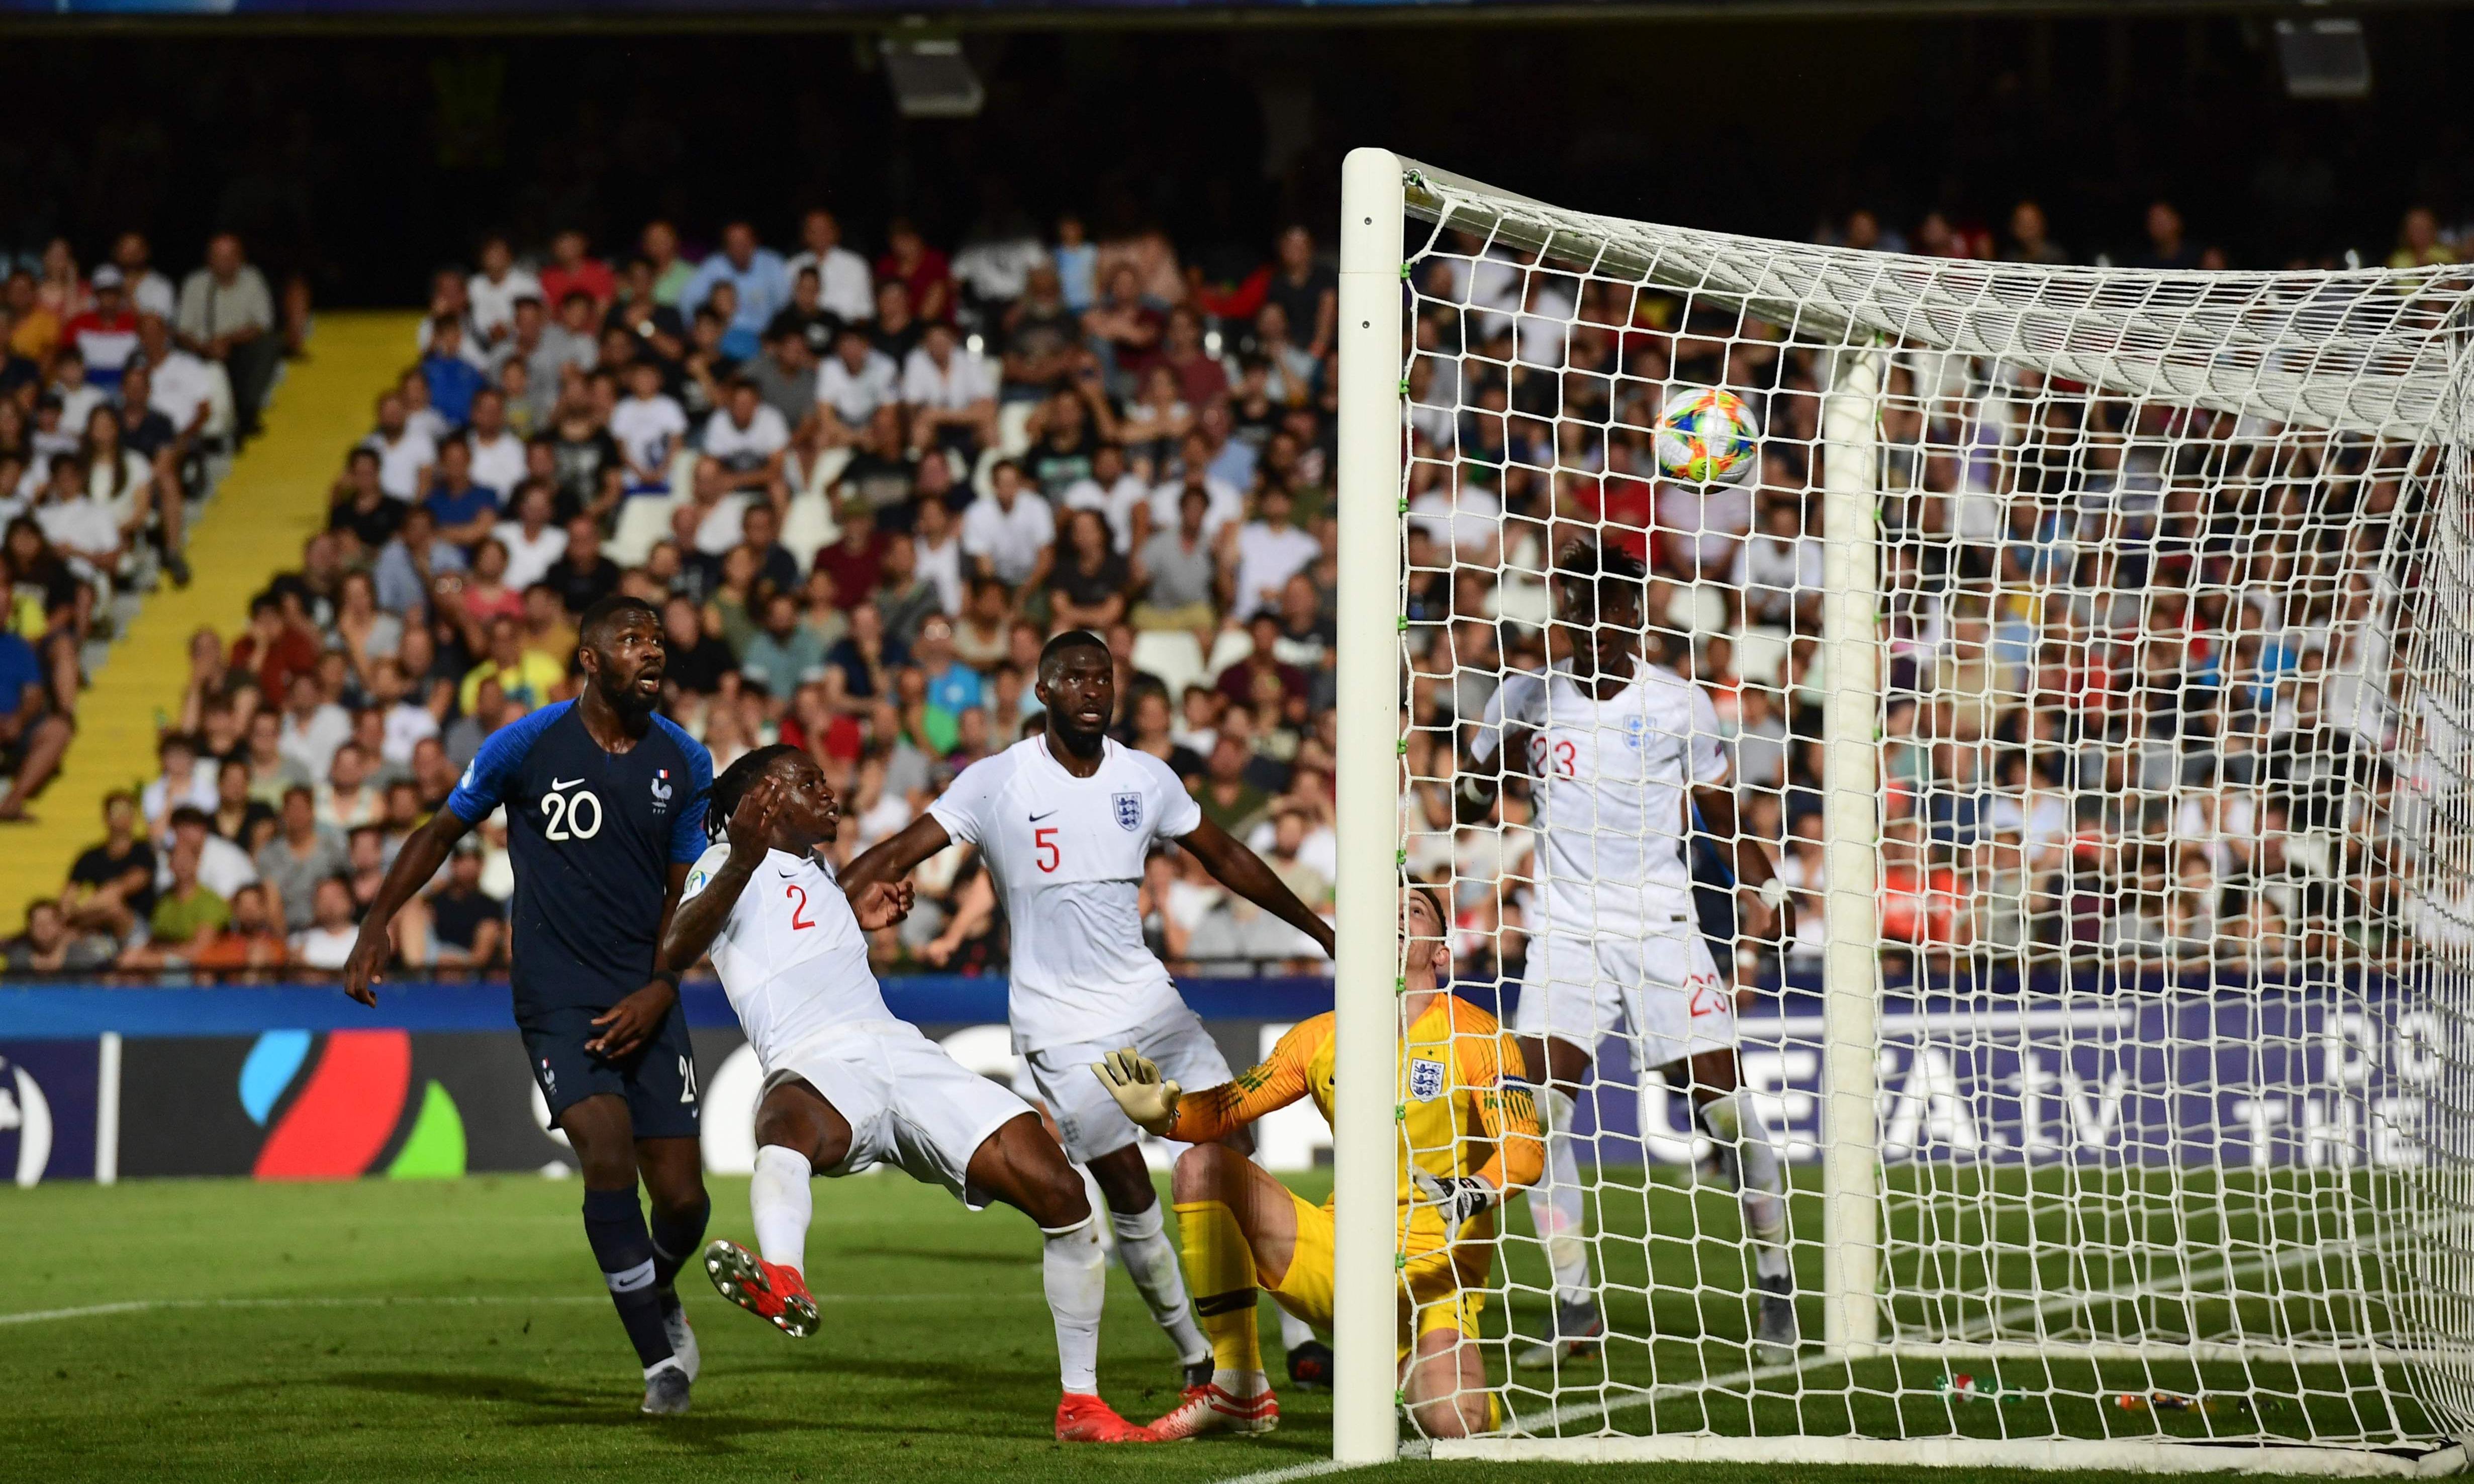 England's Wan-Bissaka gifts France win at U-21 Euros despite penalty misses